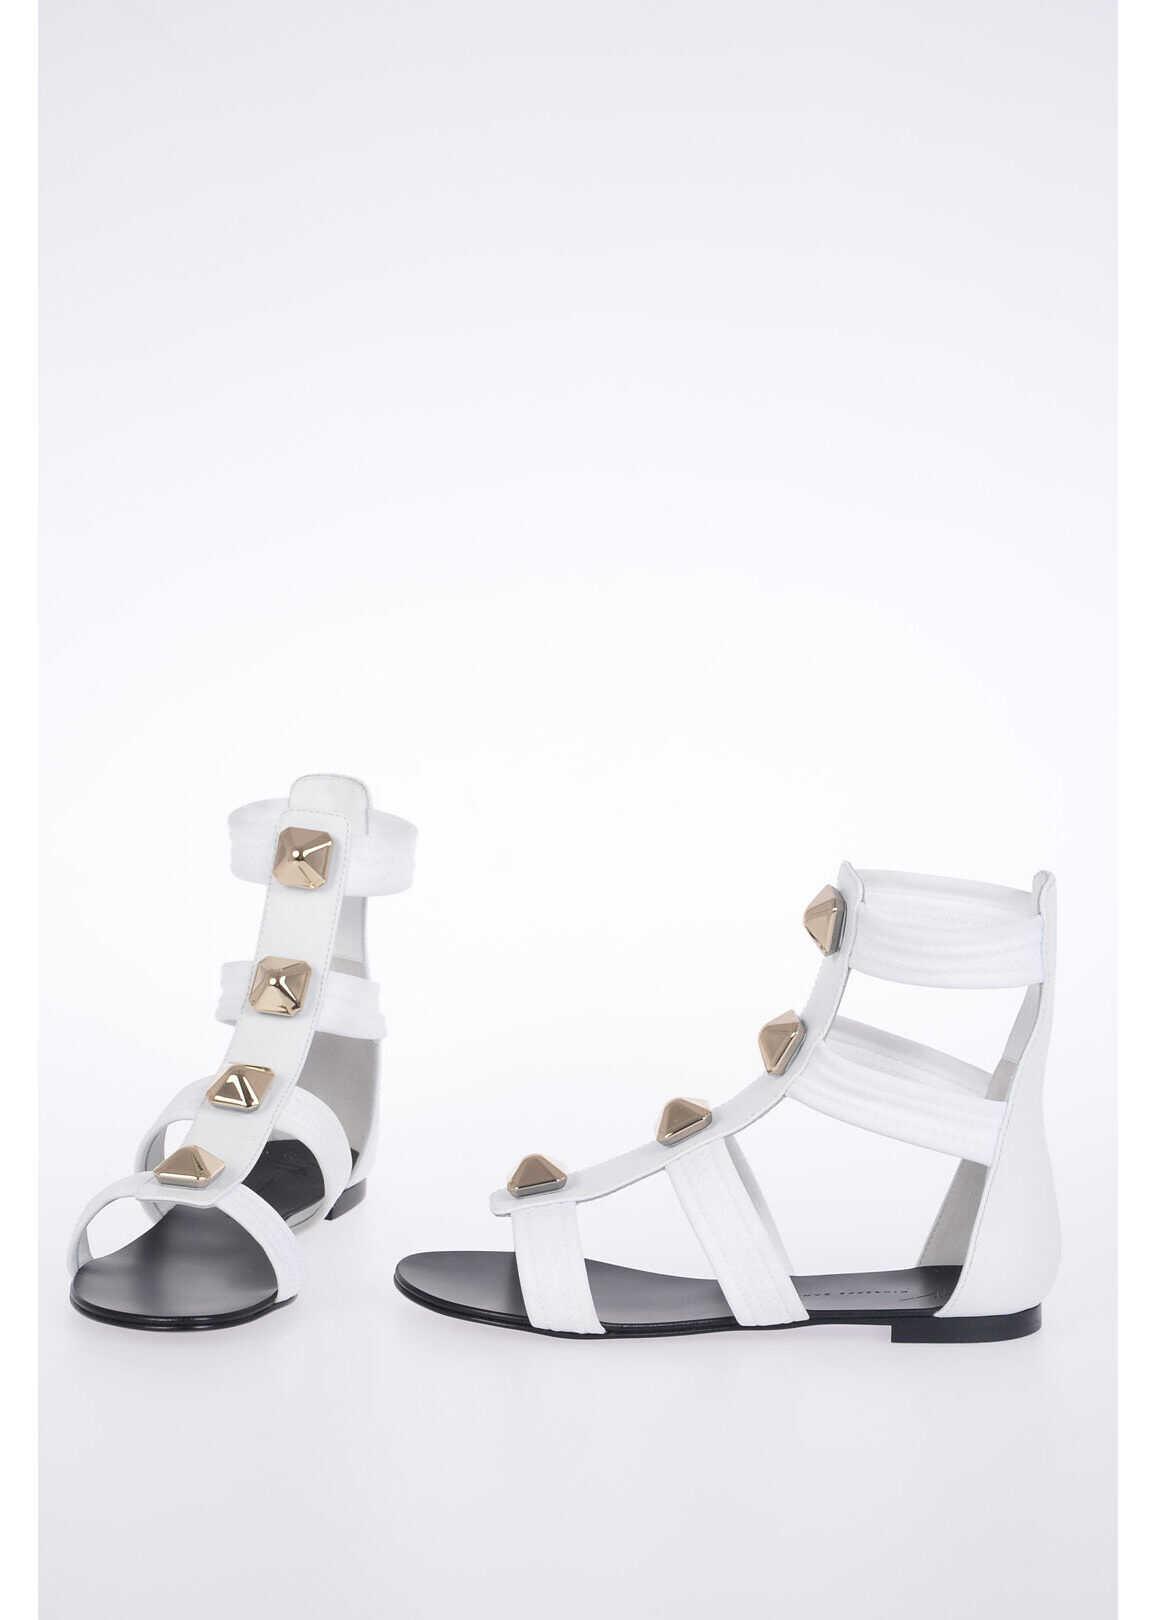 Giuseppe Zanotti Studded Leather BIREL Sandals WHITE